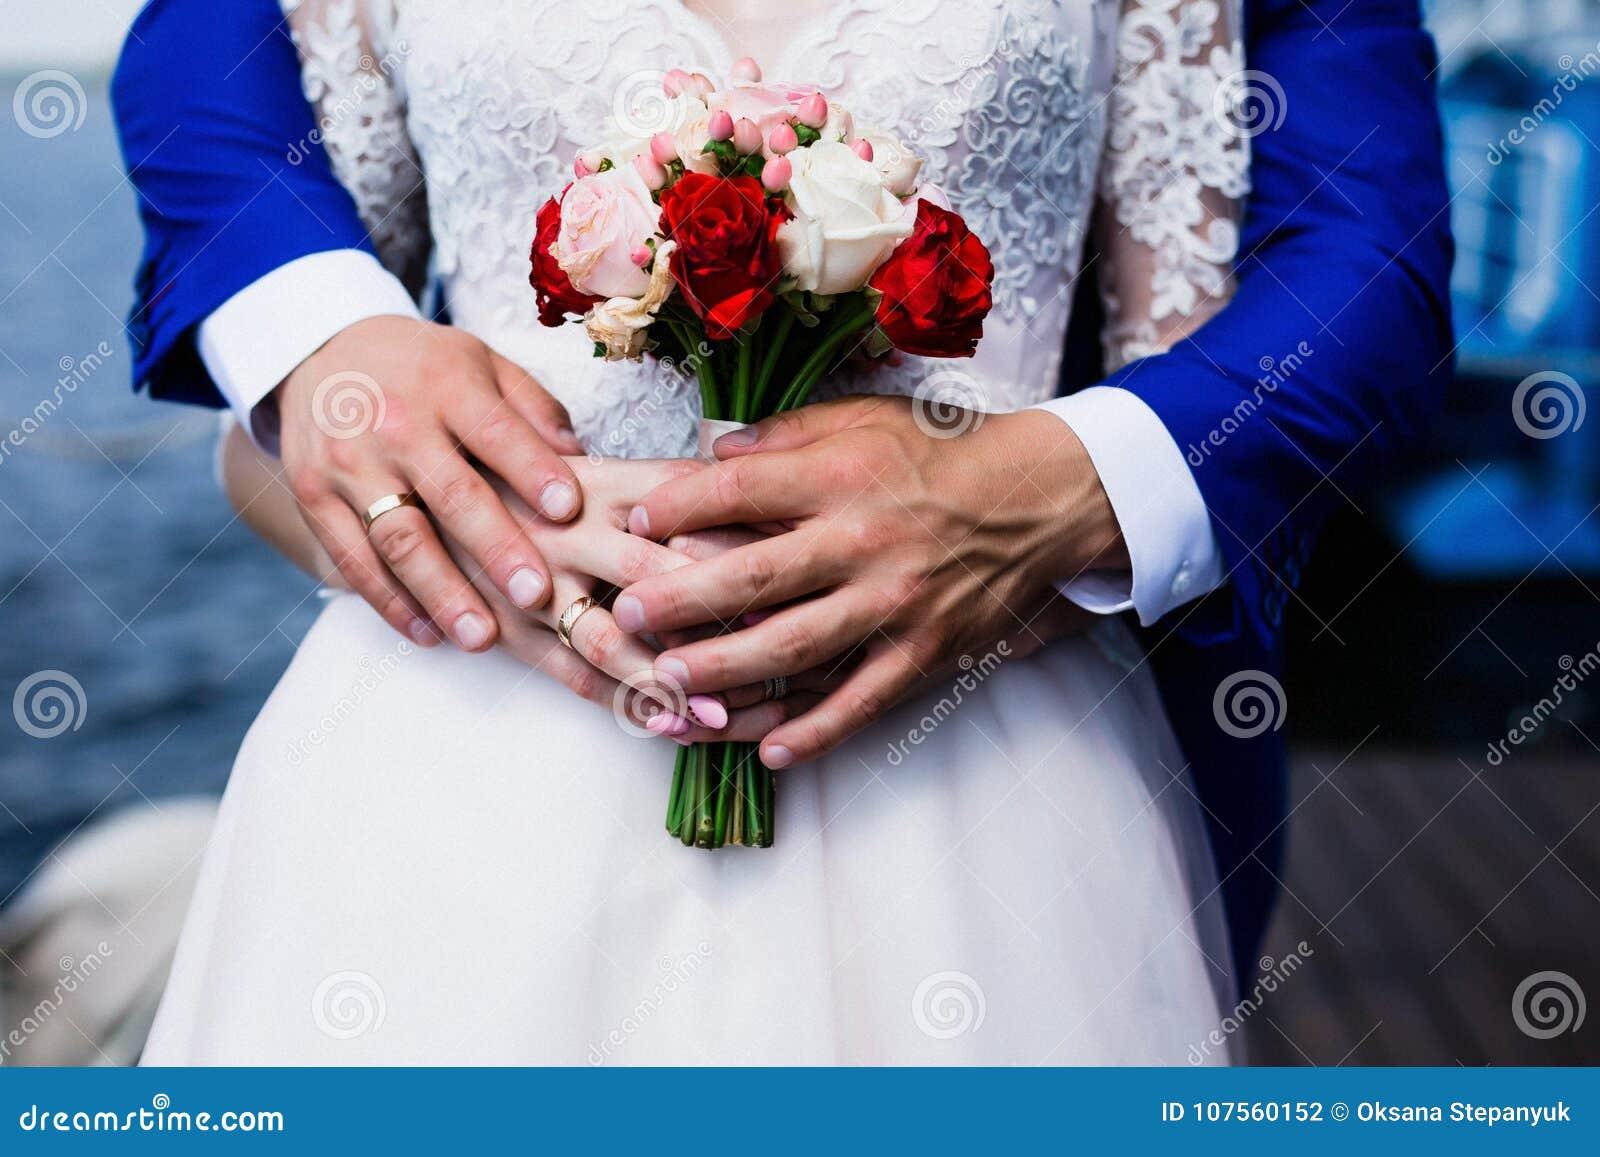 Couple wedding shoot rustic country bridal bouquets bride boho style wedding flowers elegant wedding flower bouquets bridal brooch bouquet vintage bohemian flowers ideas couple hug boho style wedding flowers izmirmasajfo